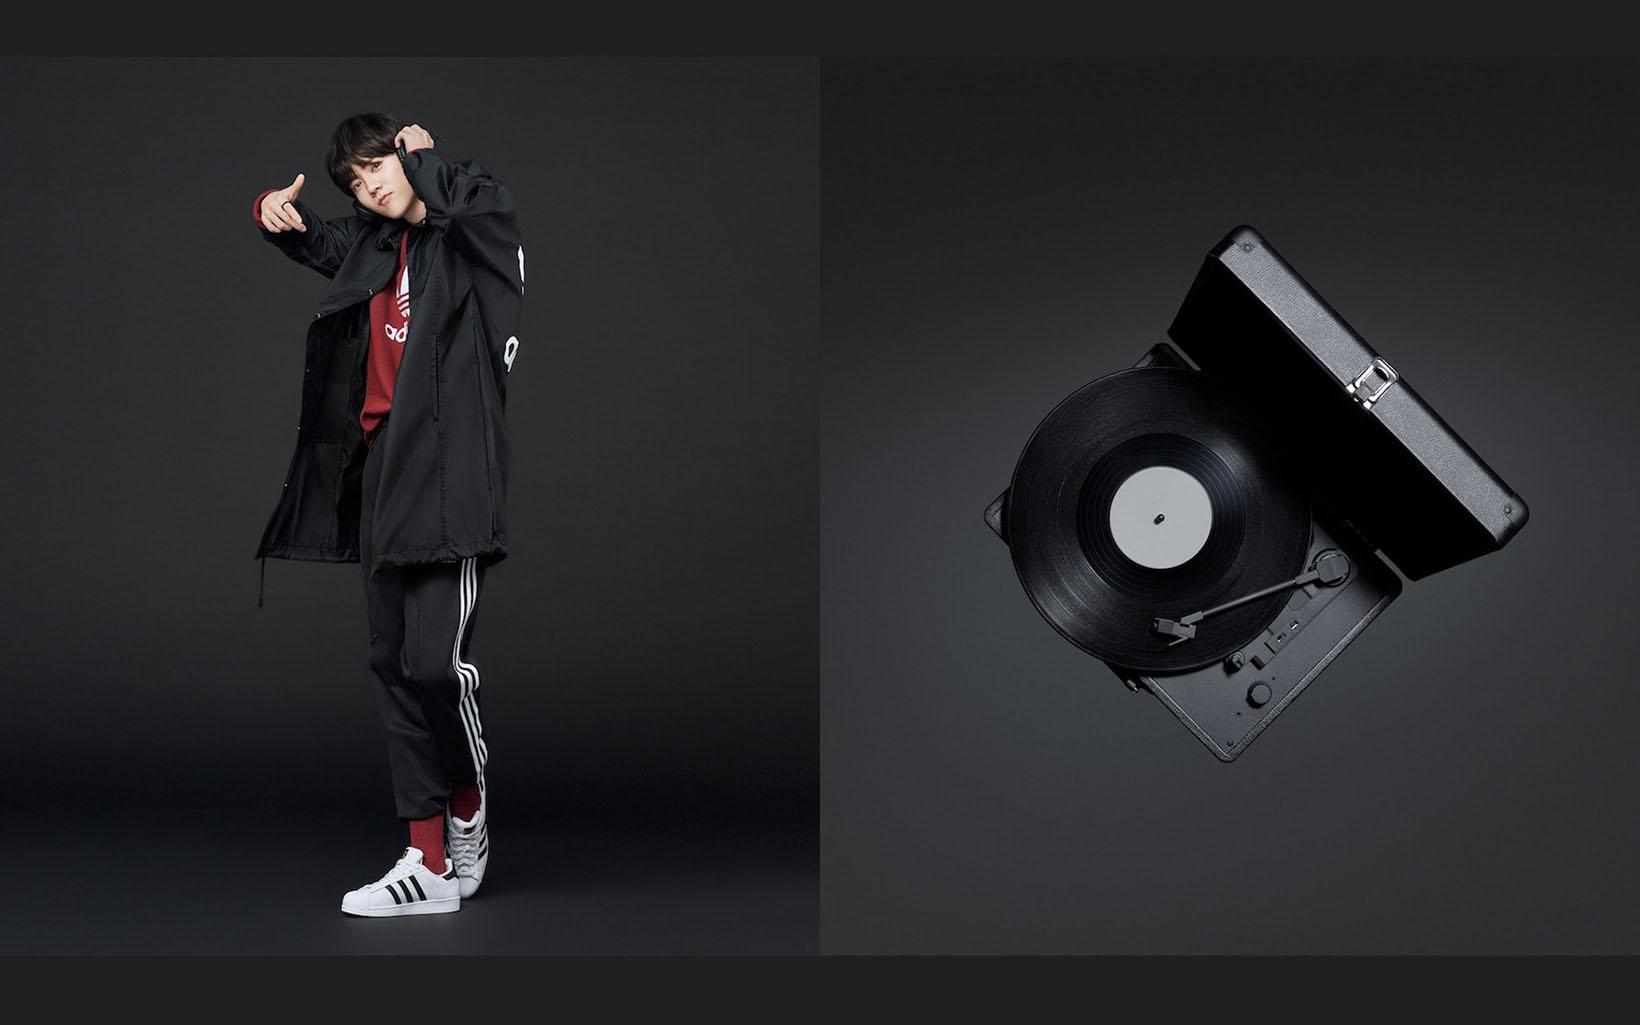 adidas-spring-summer-2018-adicolor-series-collection-12